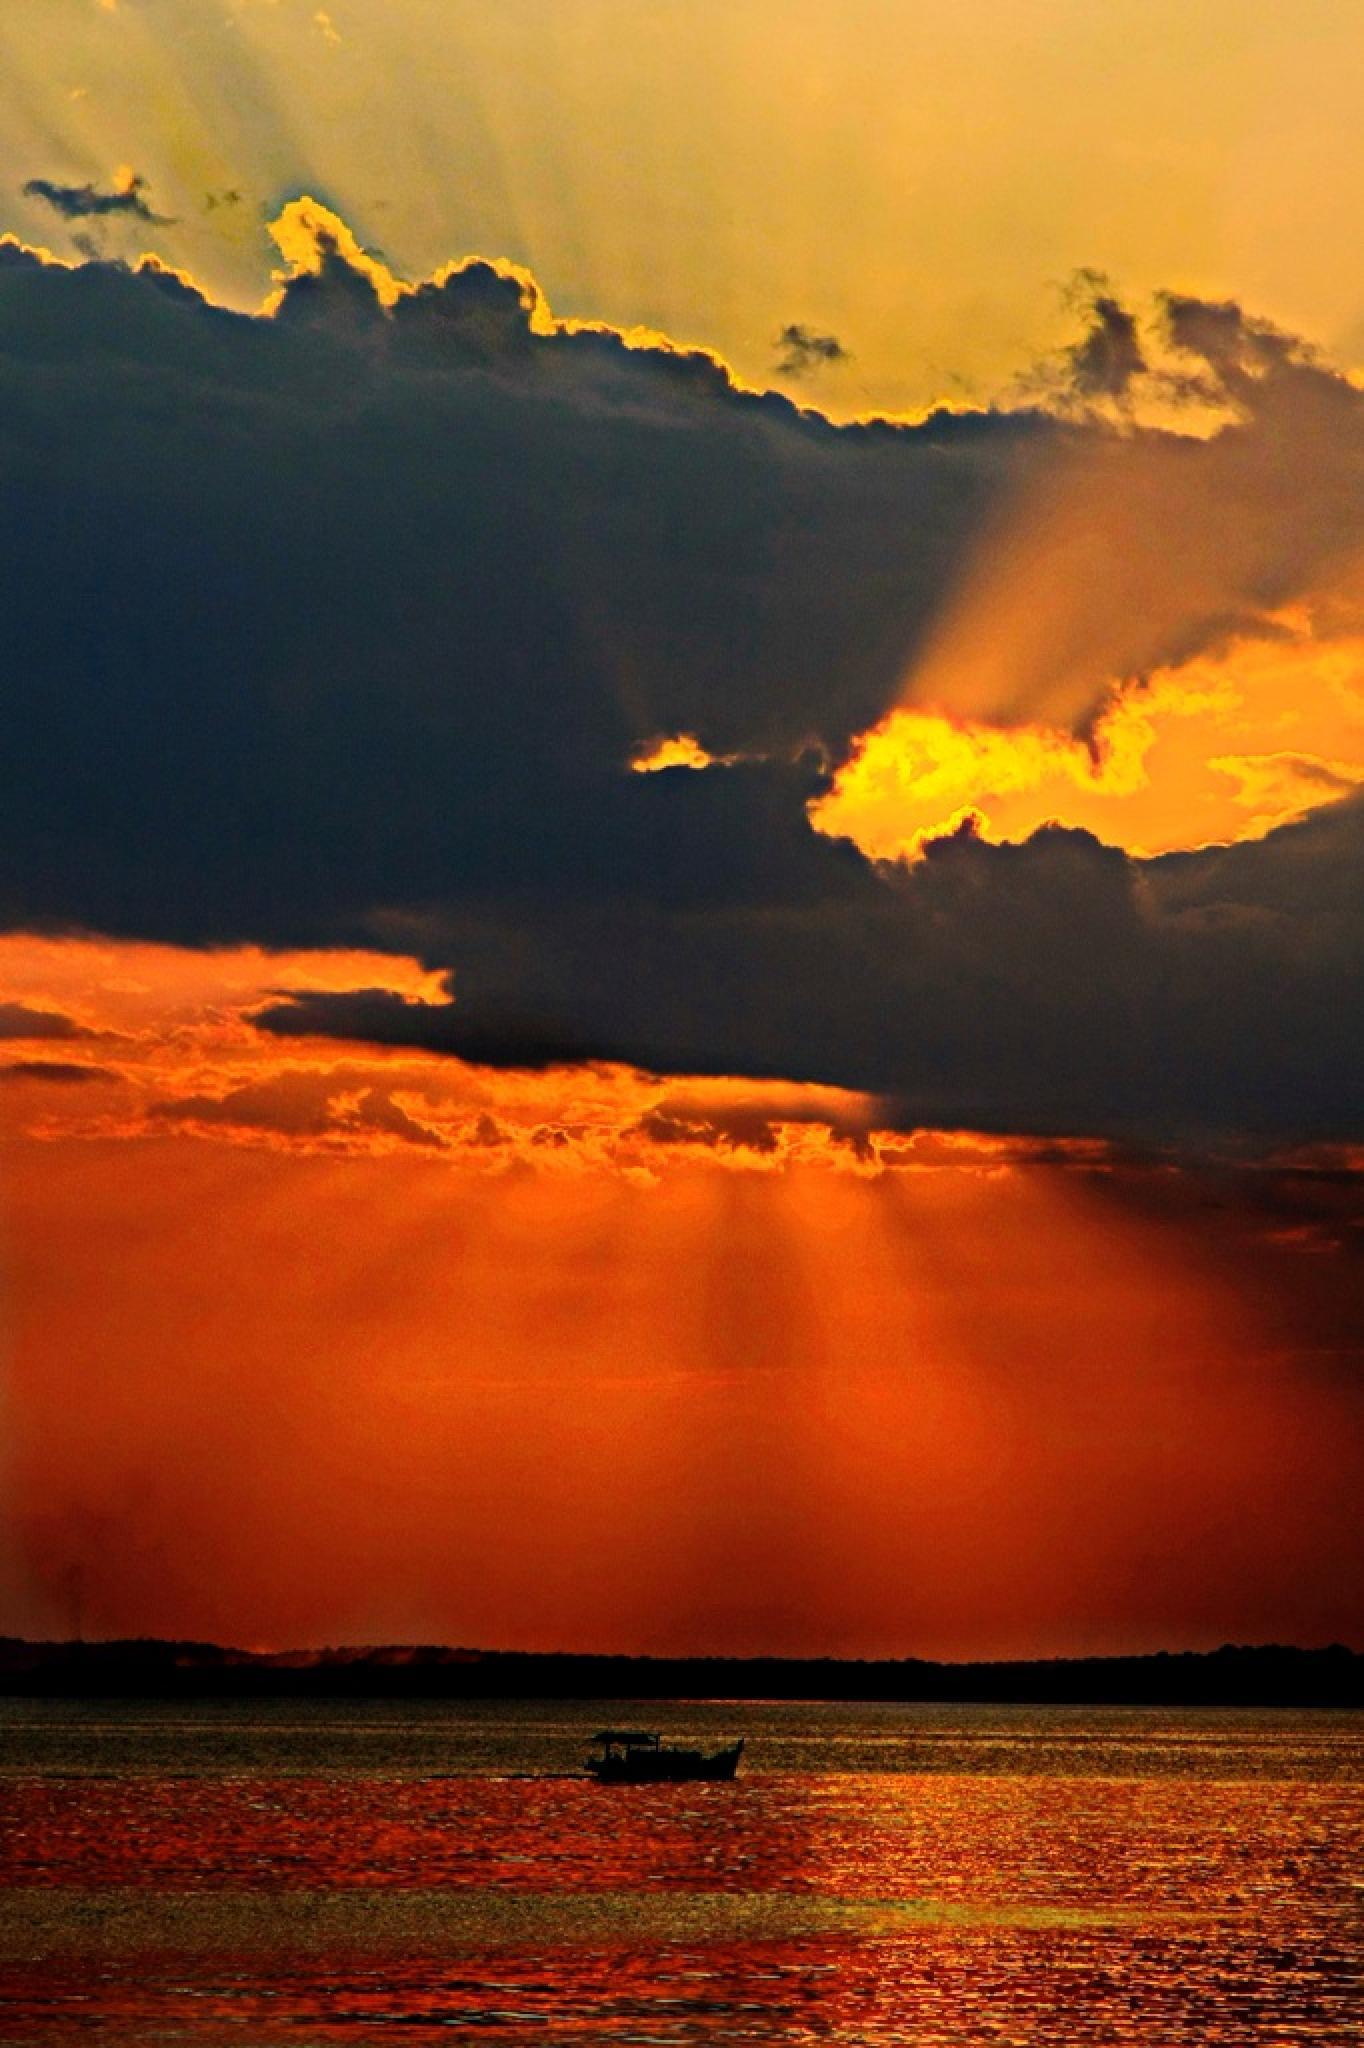 ROL on Sunset by rizal prasetyo